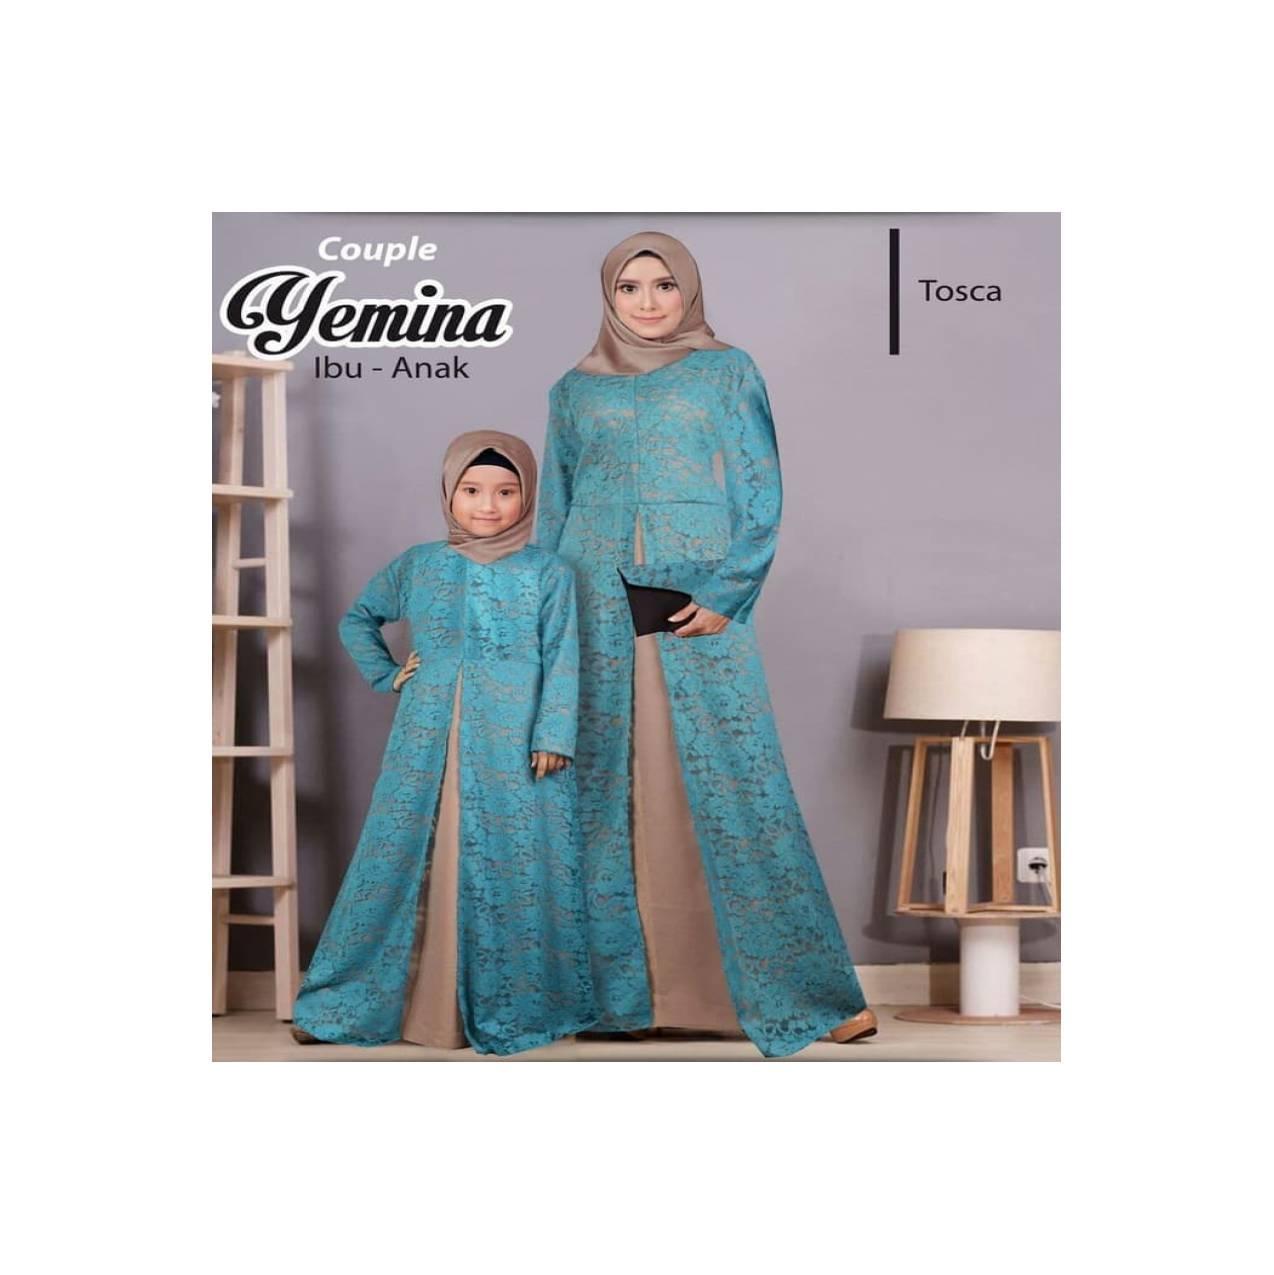 Baju Gamis Couple ibu dan Anak - Gamis Couple yemina tosca